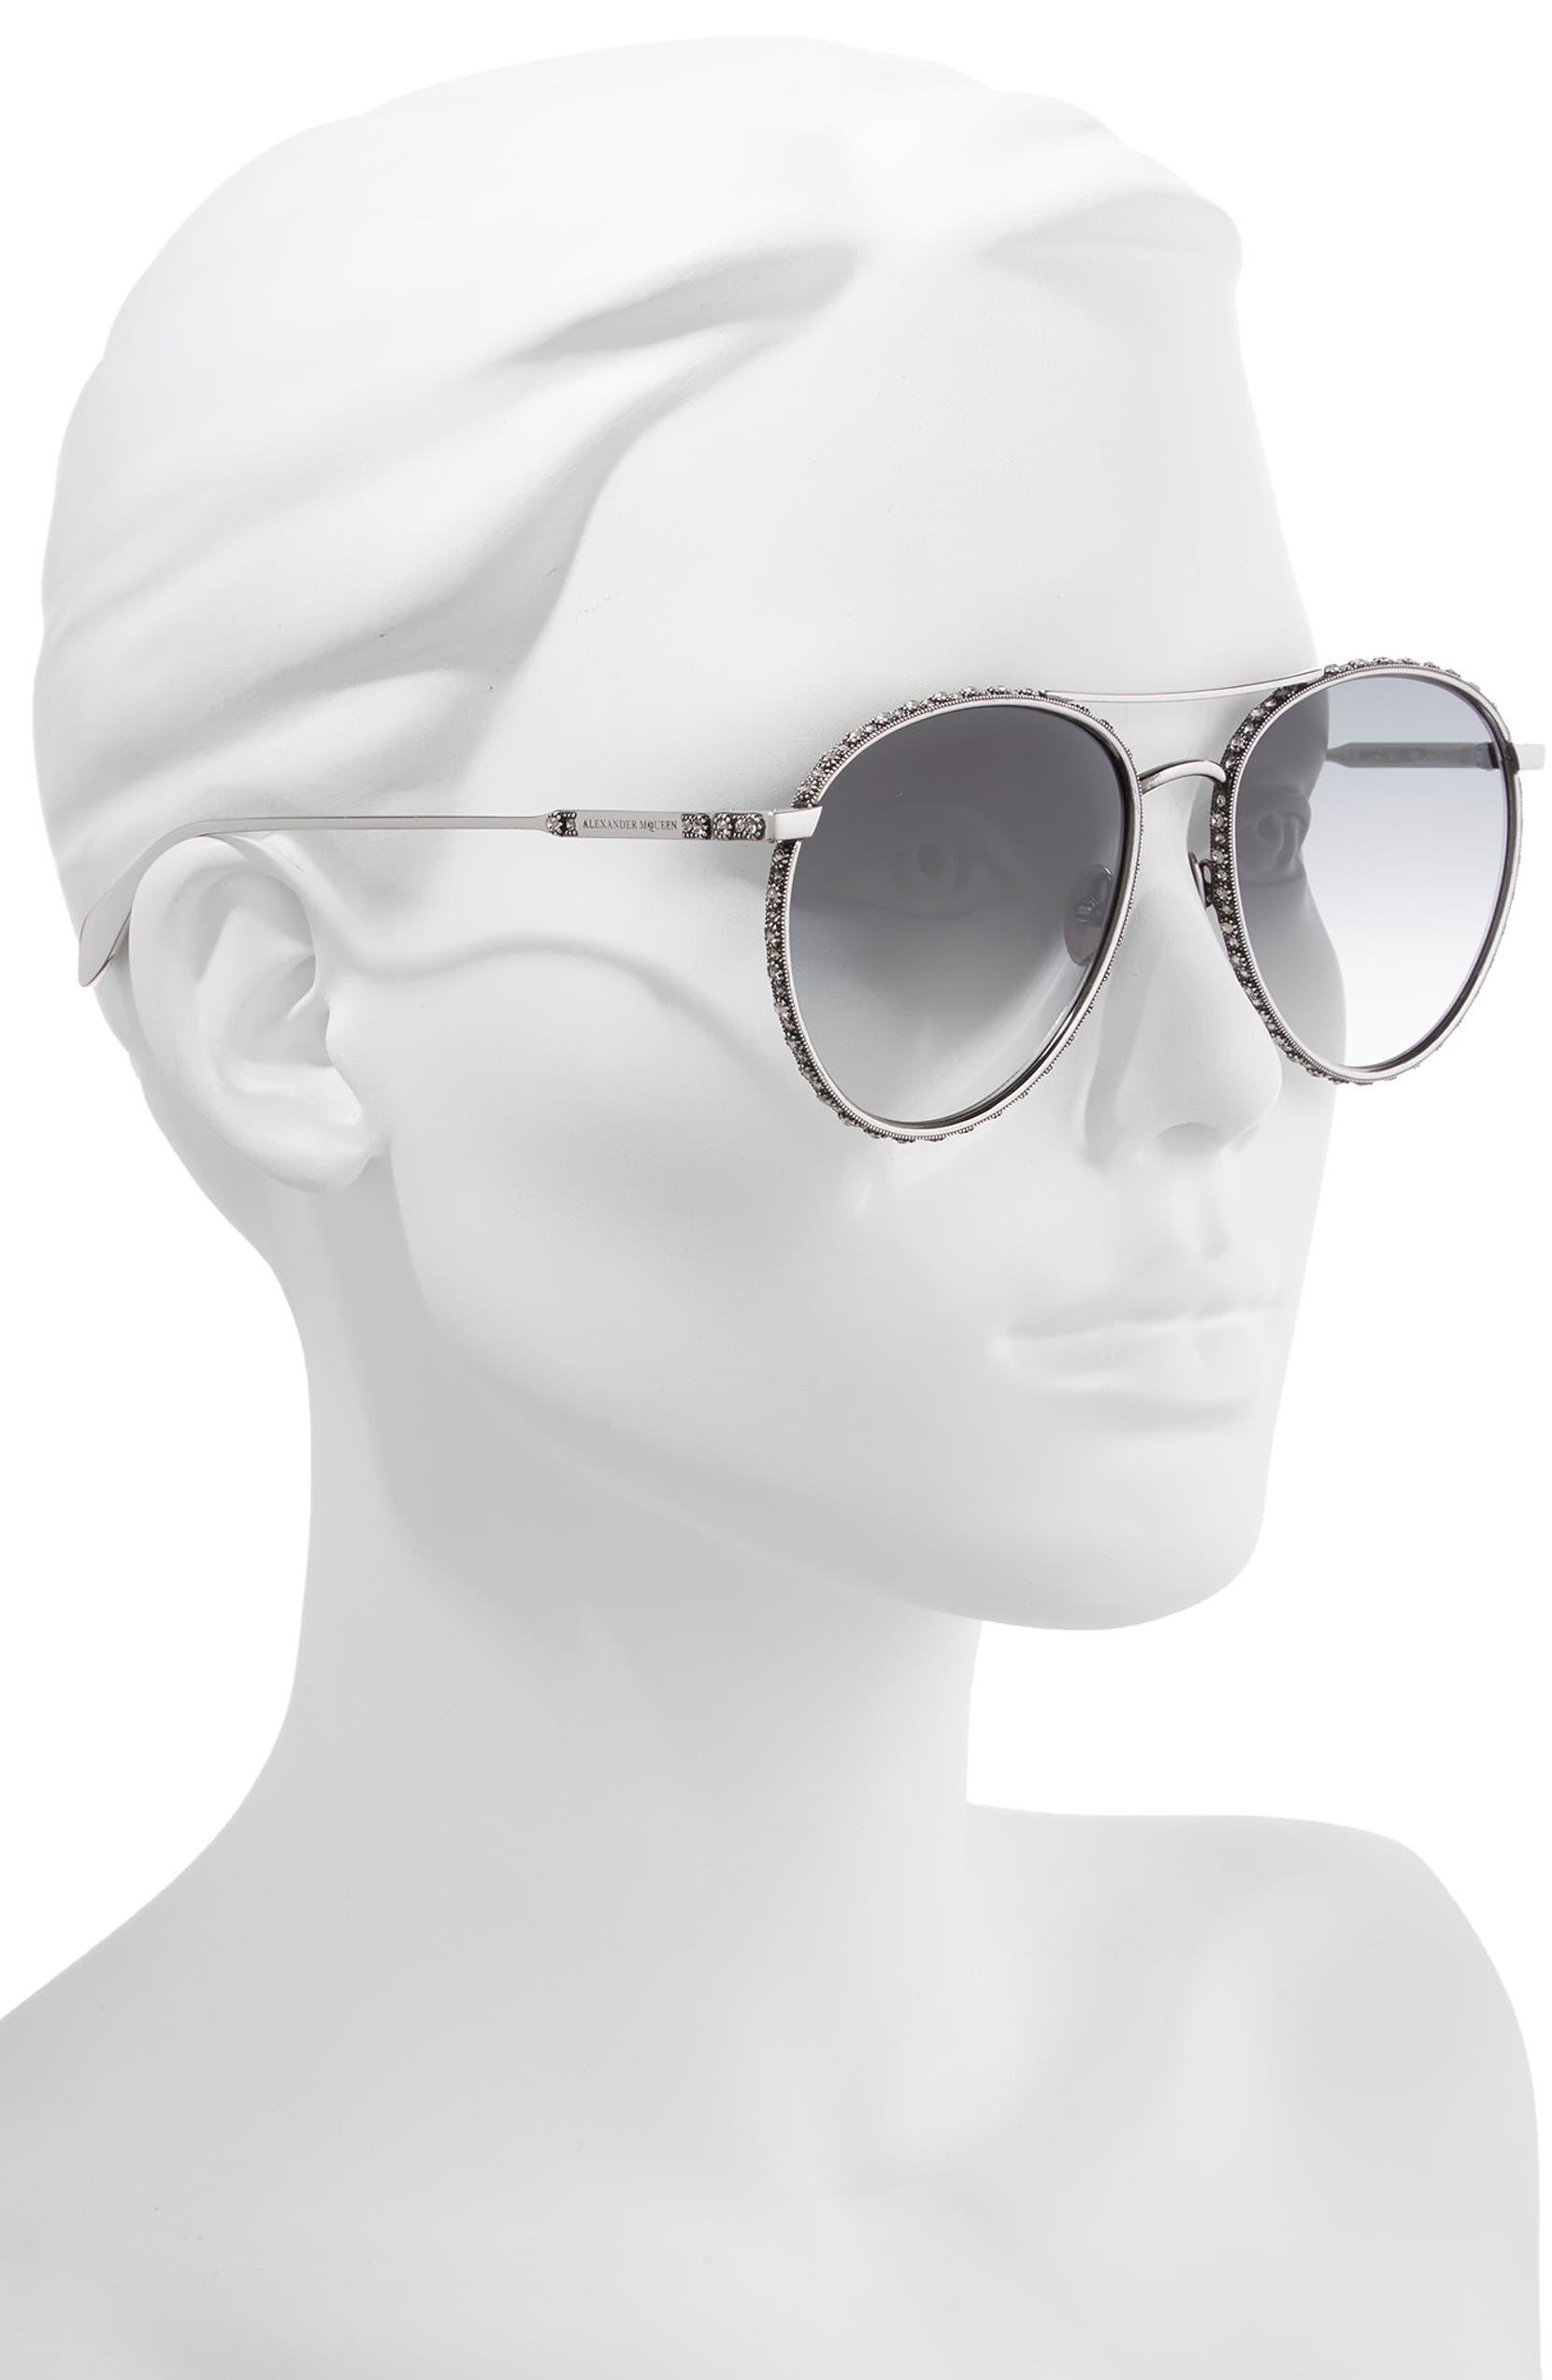 fdf285e713a8 Alexander McQueen 58mm Swarovski Crystal Trim Round Aviator Sunglasses |  Nordstrom